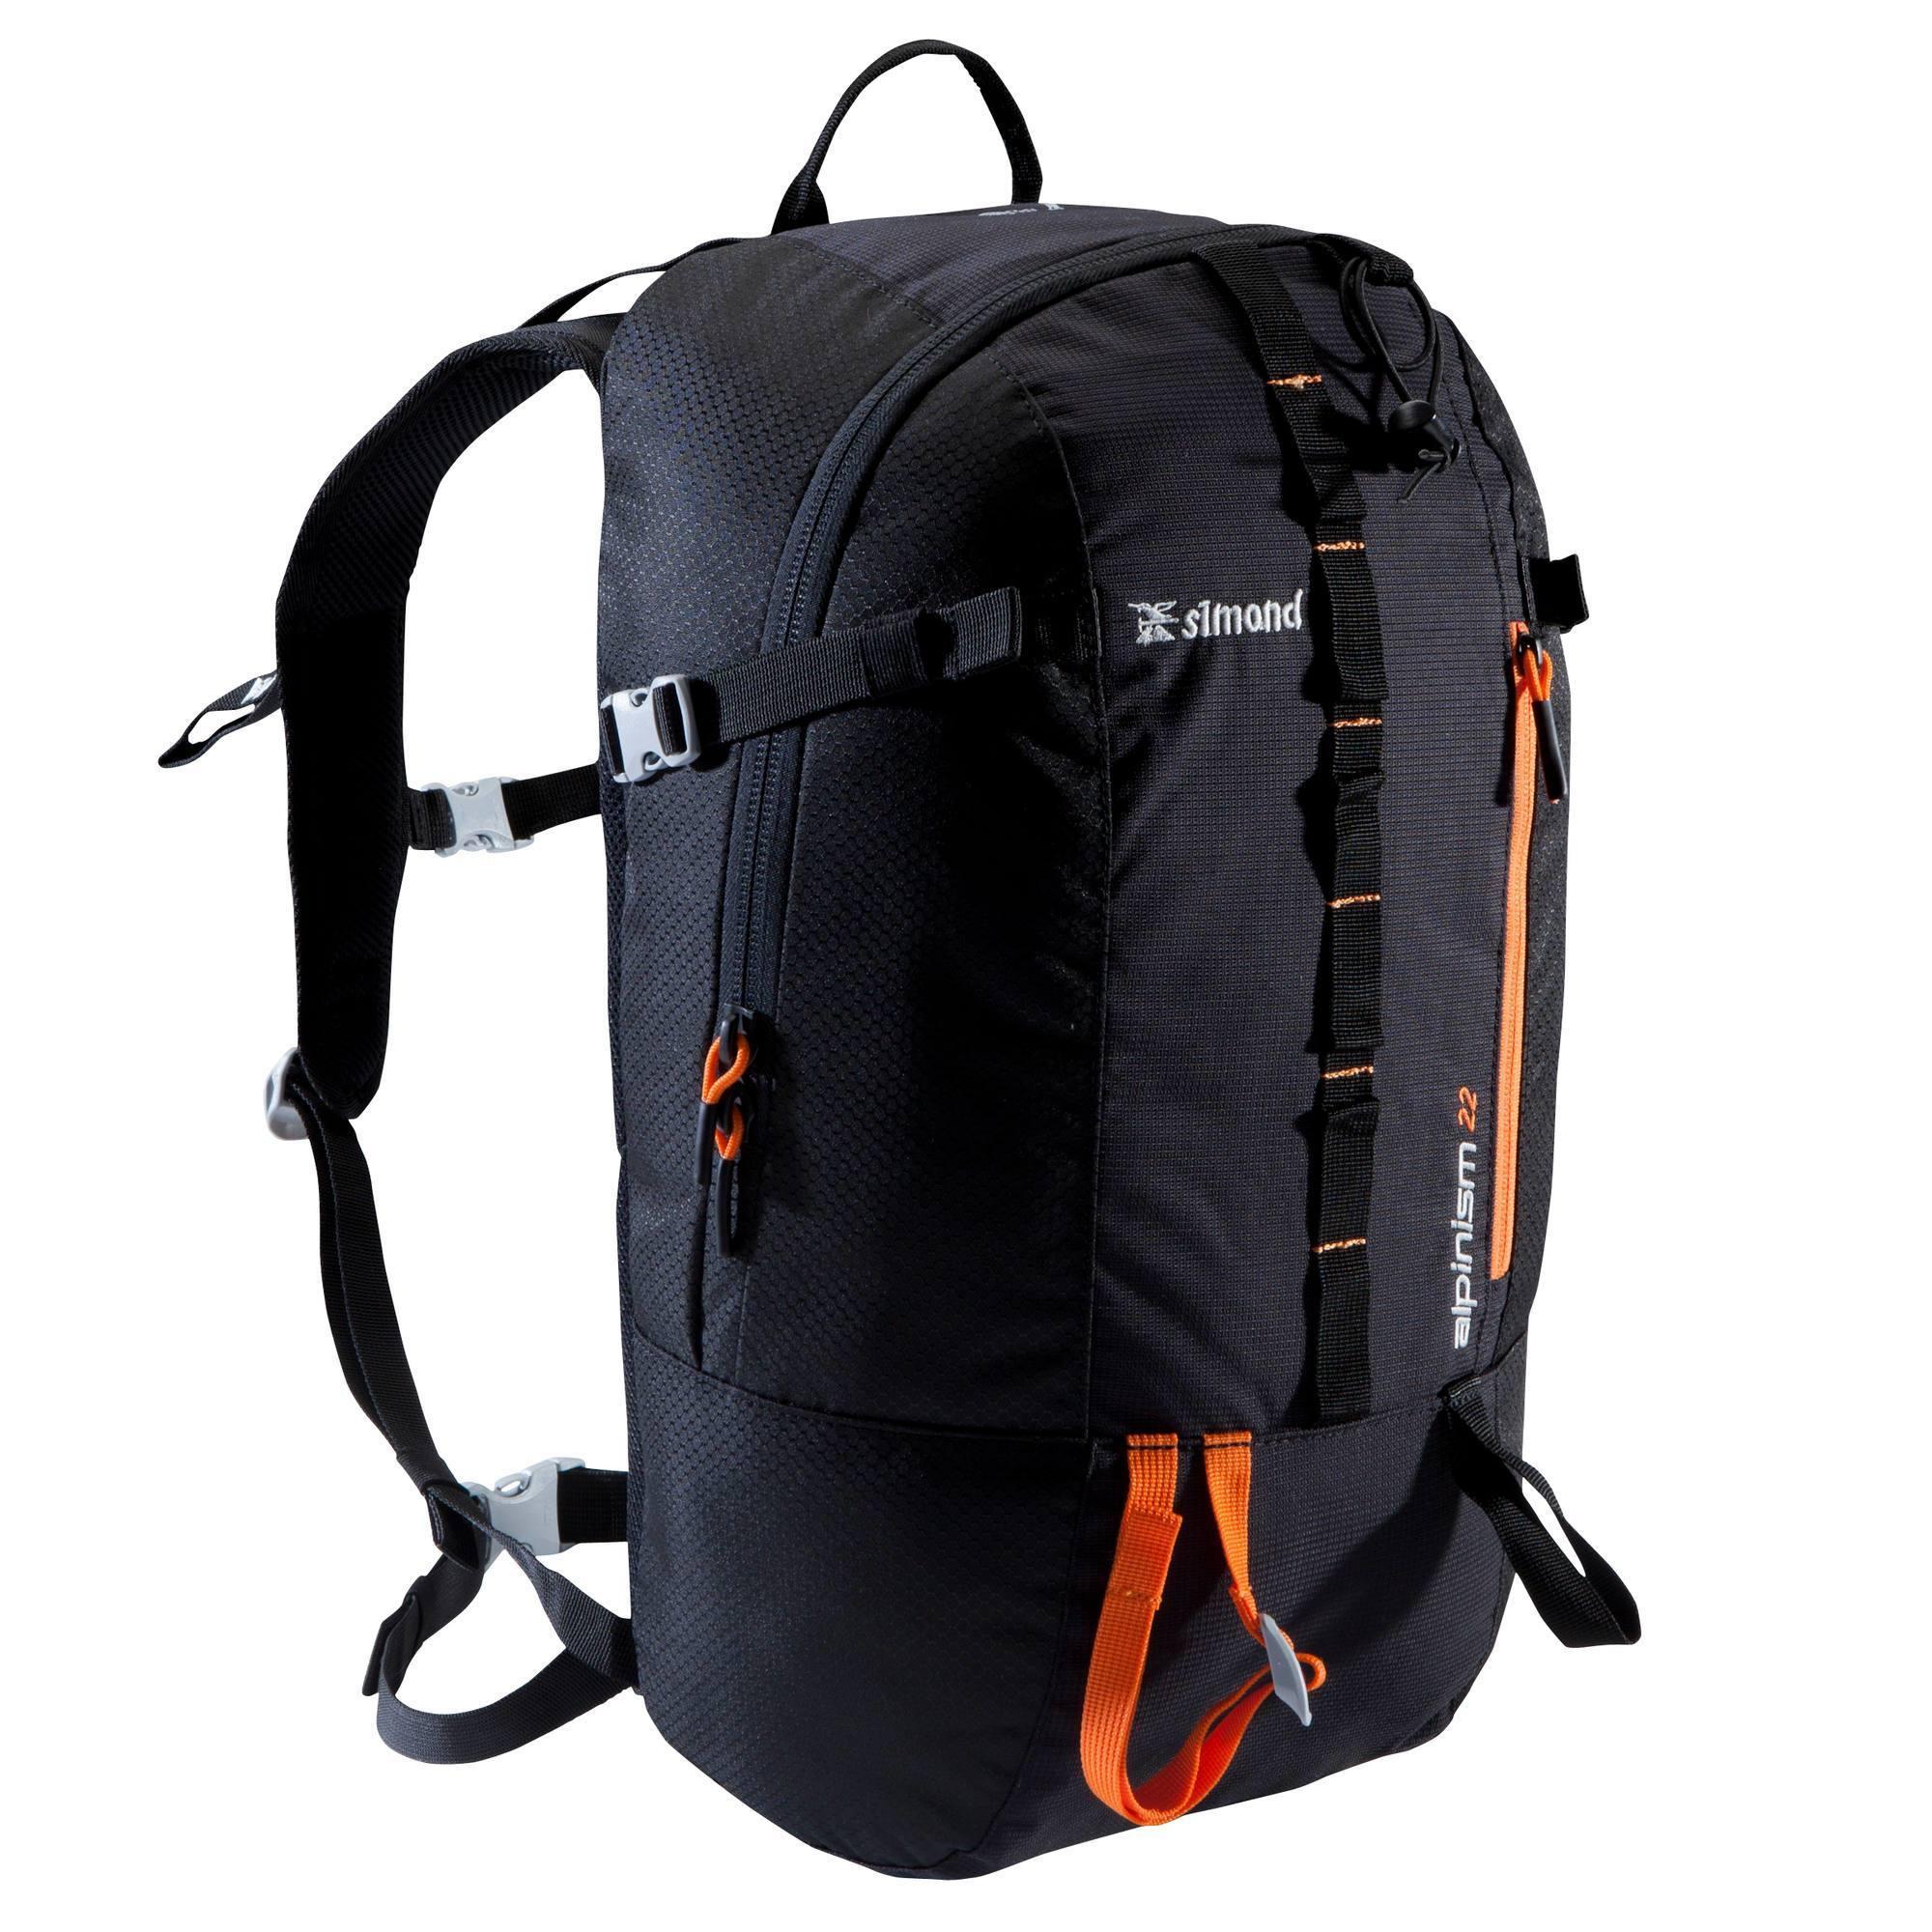 2000x2000 Backpacks Simond